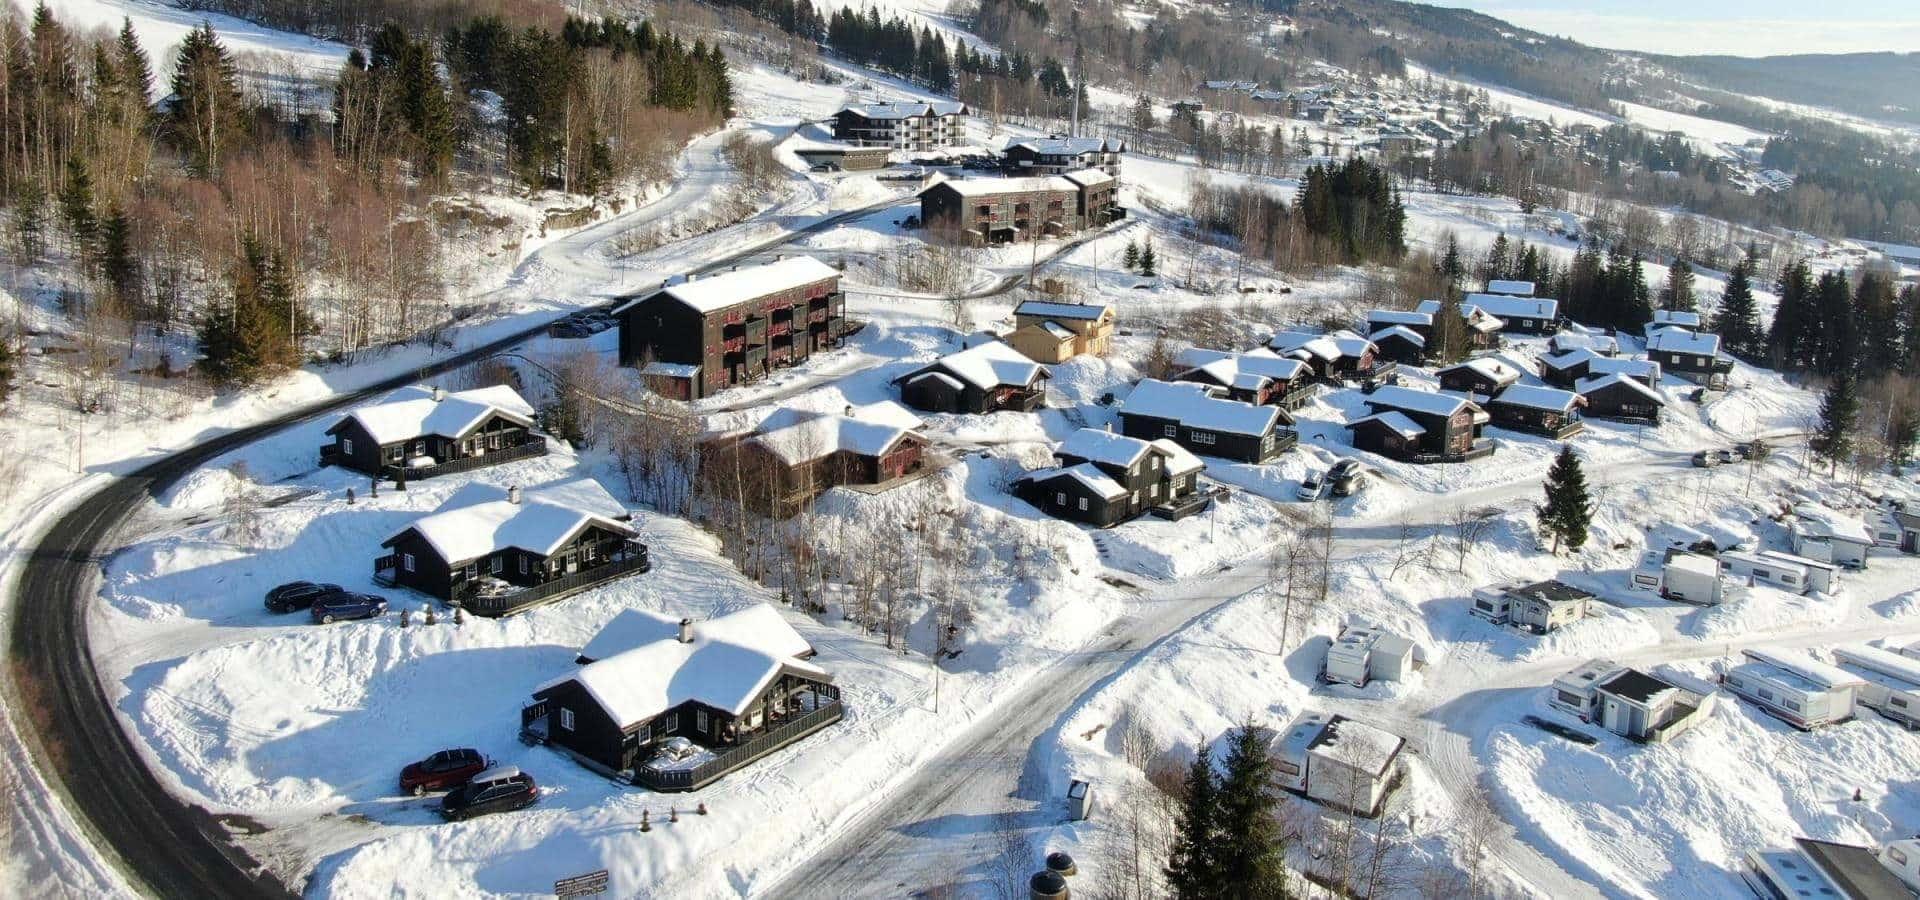 Nordlia hytter - Hafjell - skirejse - AlfA Travel - område